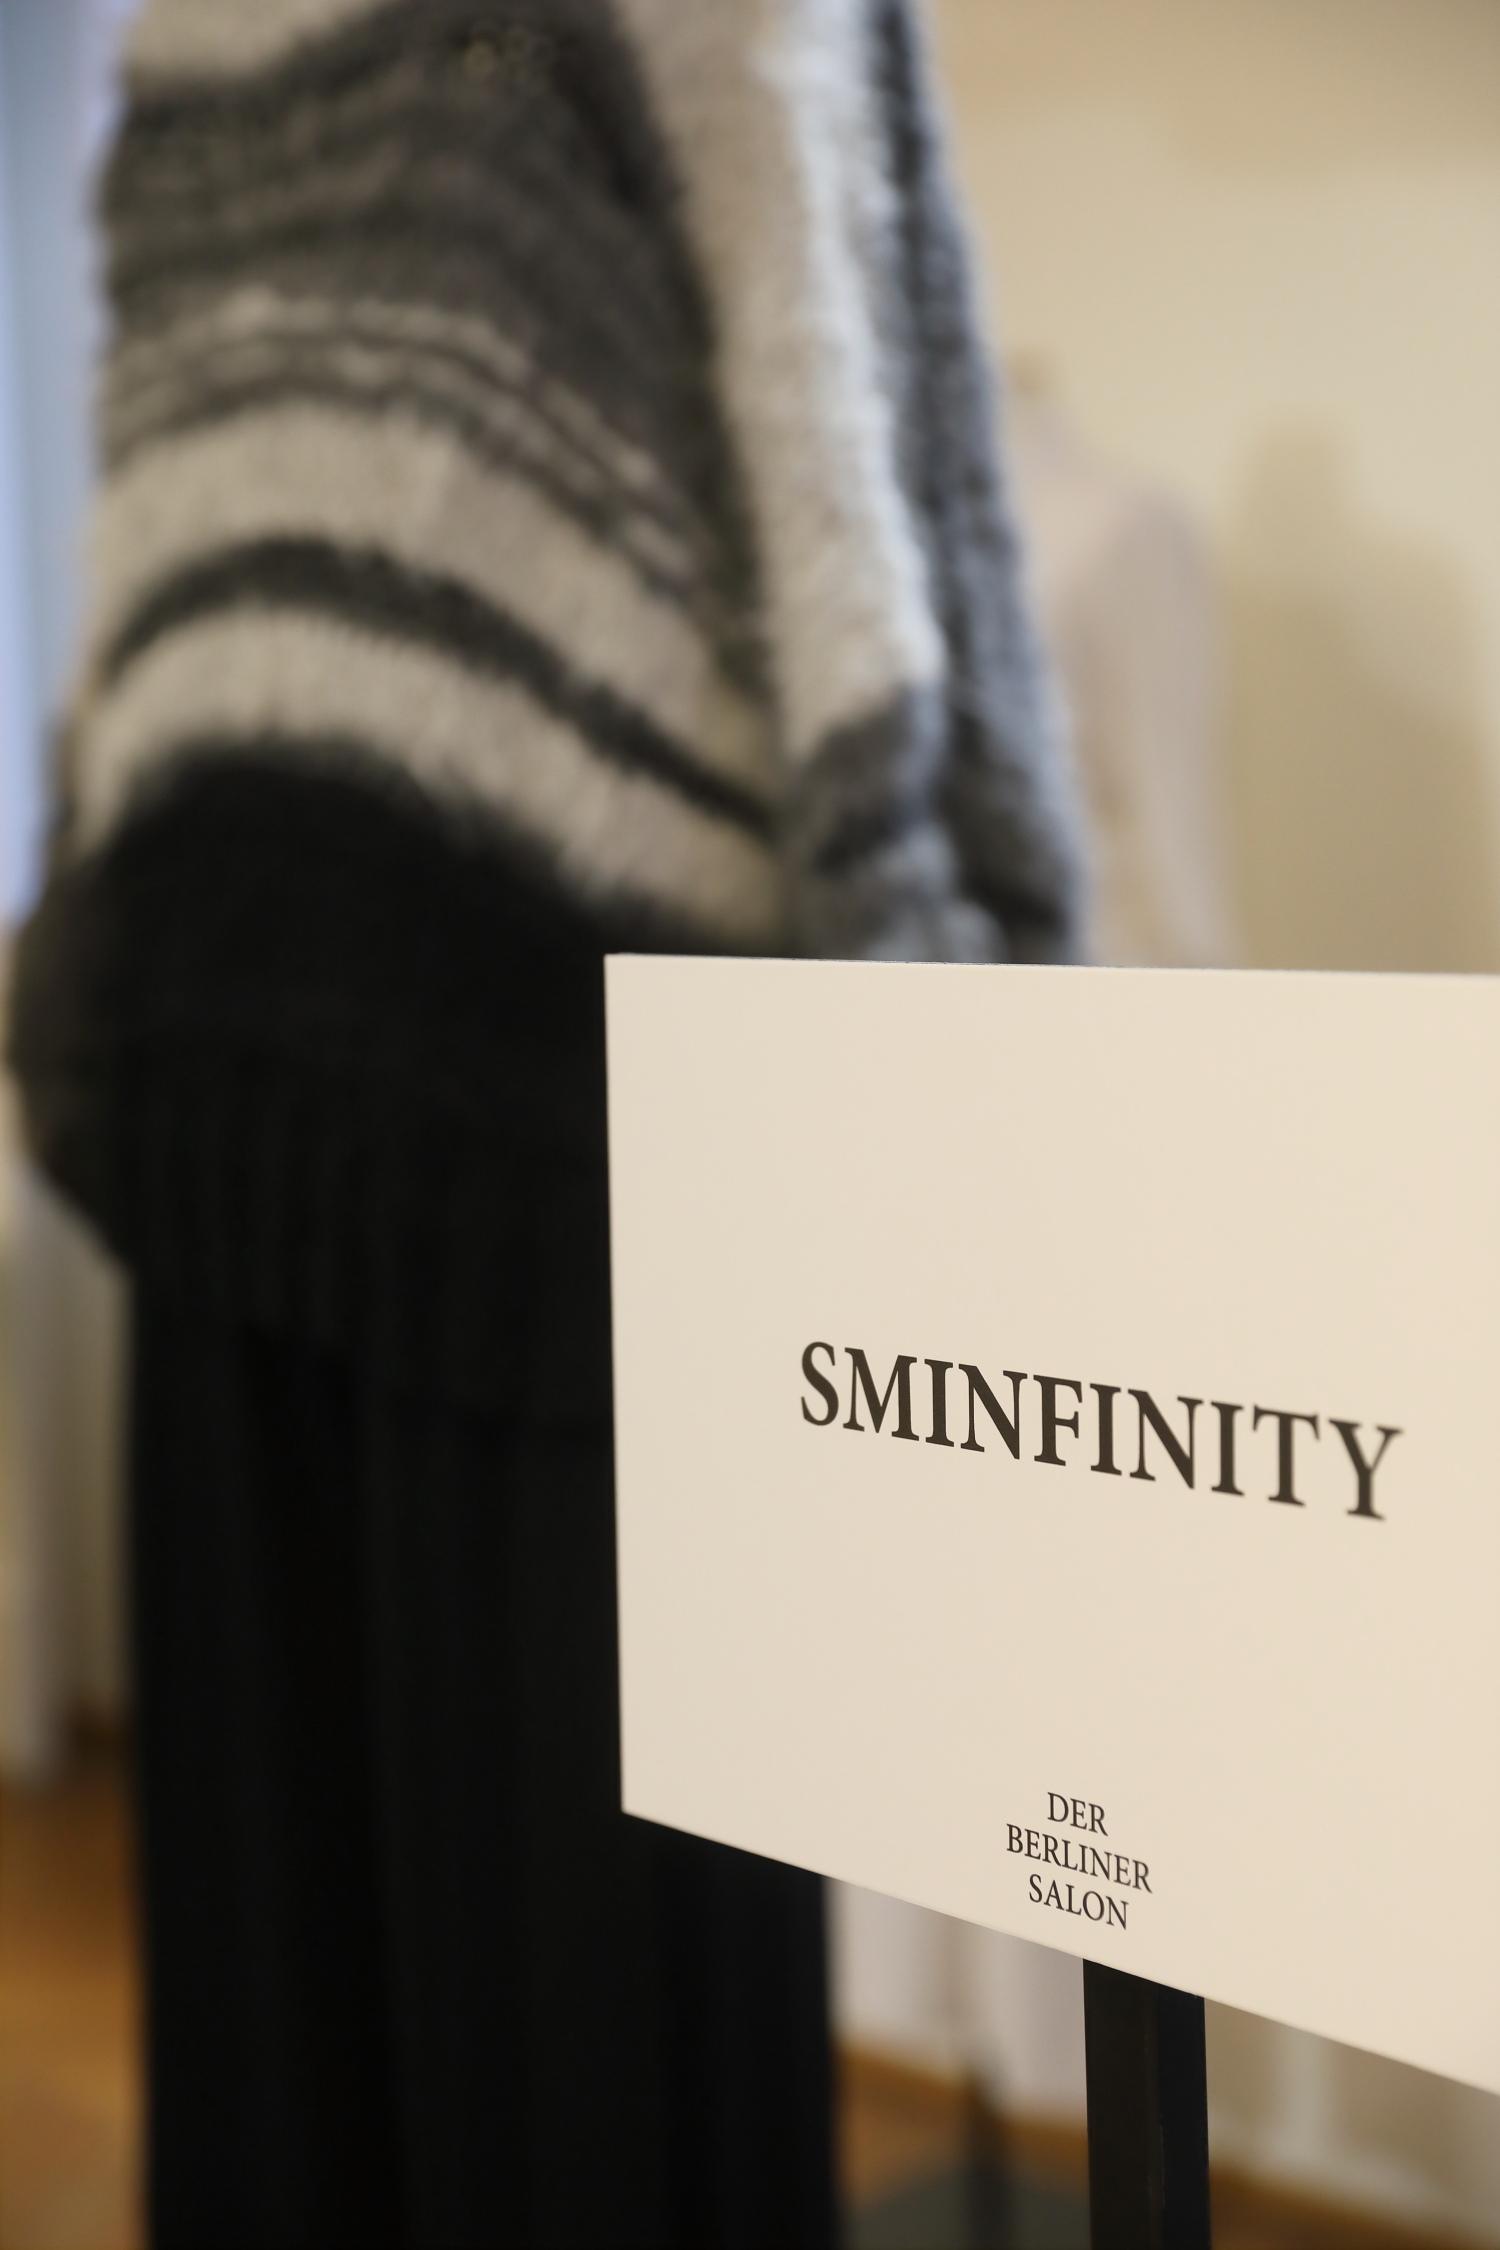 SMINFINITY_DBS_B7A8944.JPG